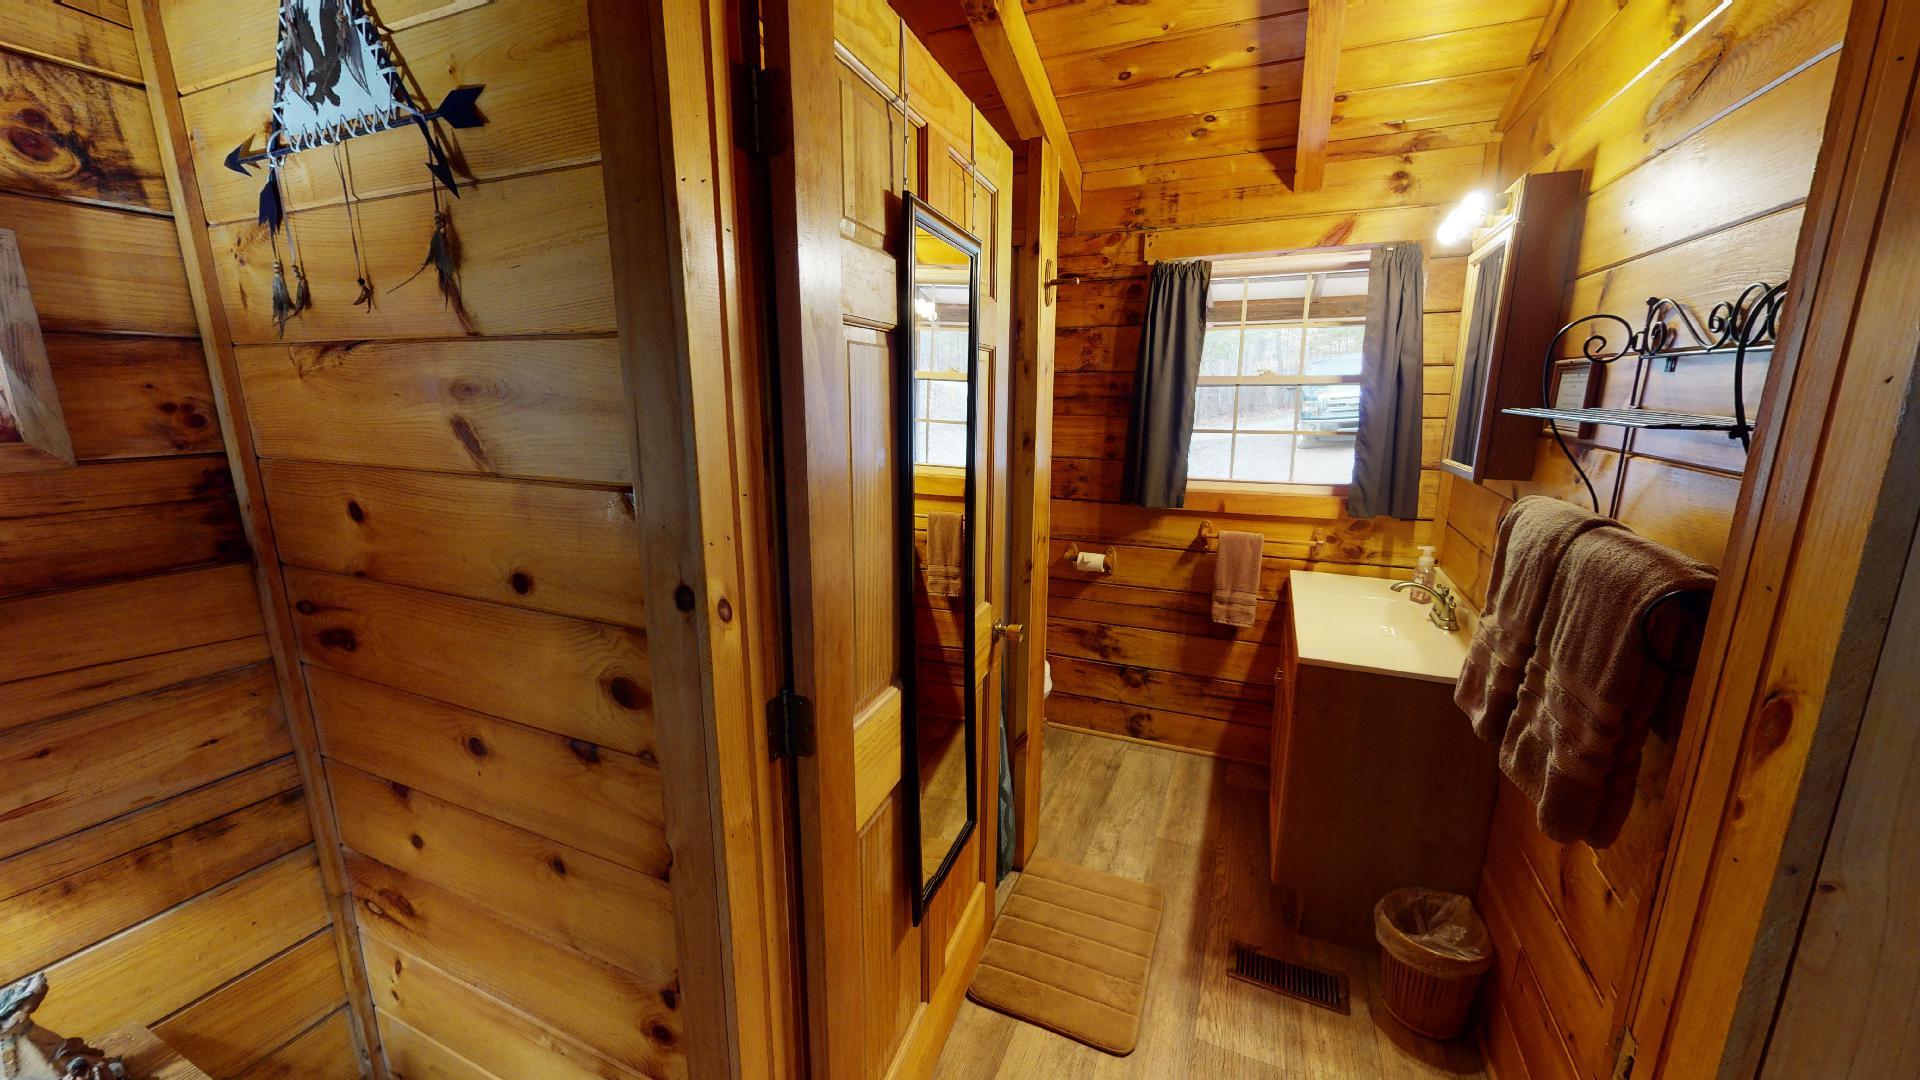 The Lakota Bathroom - Private bathroom with walk in shower.